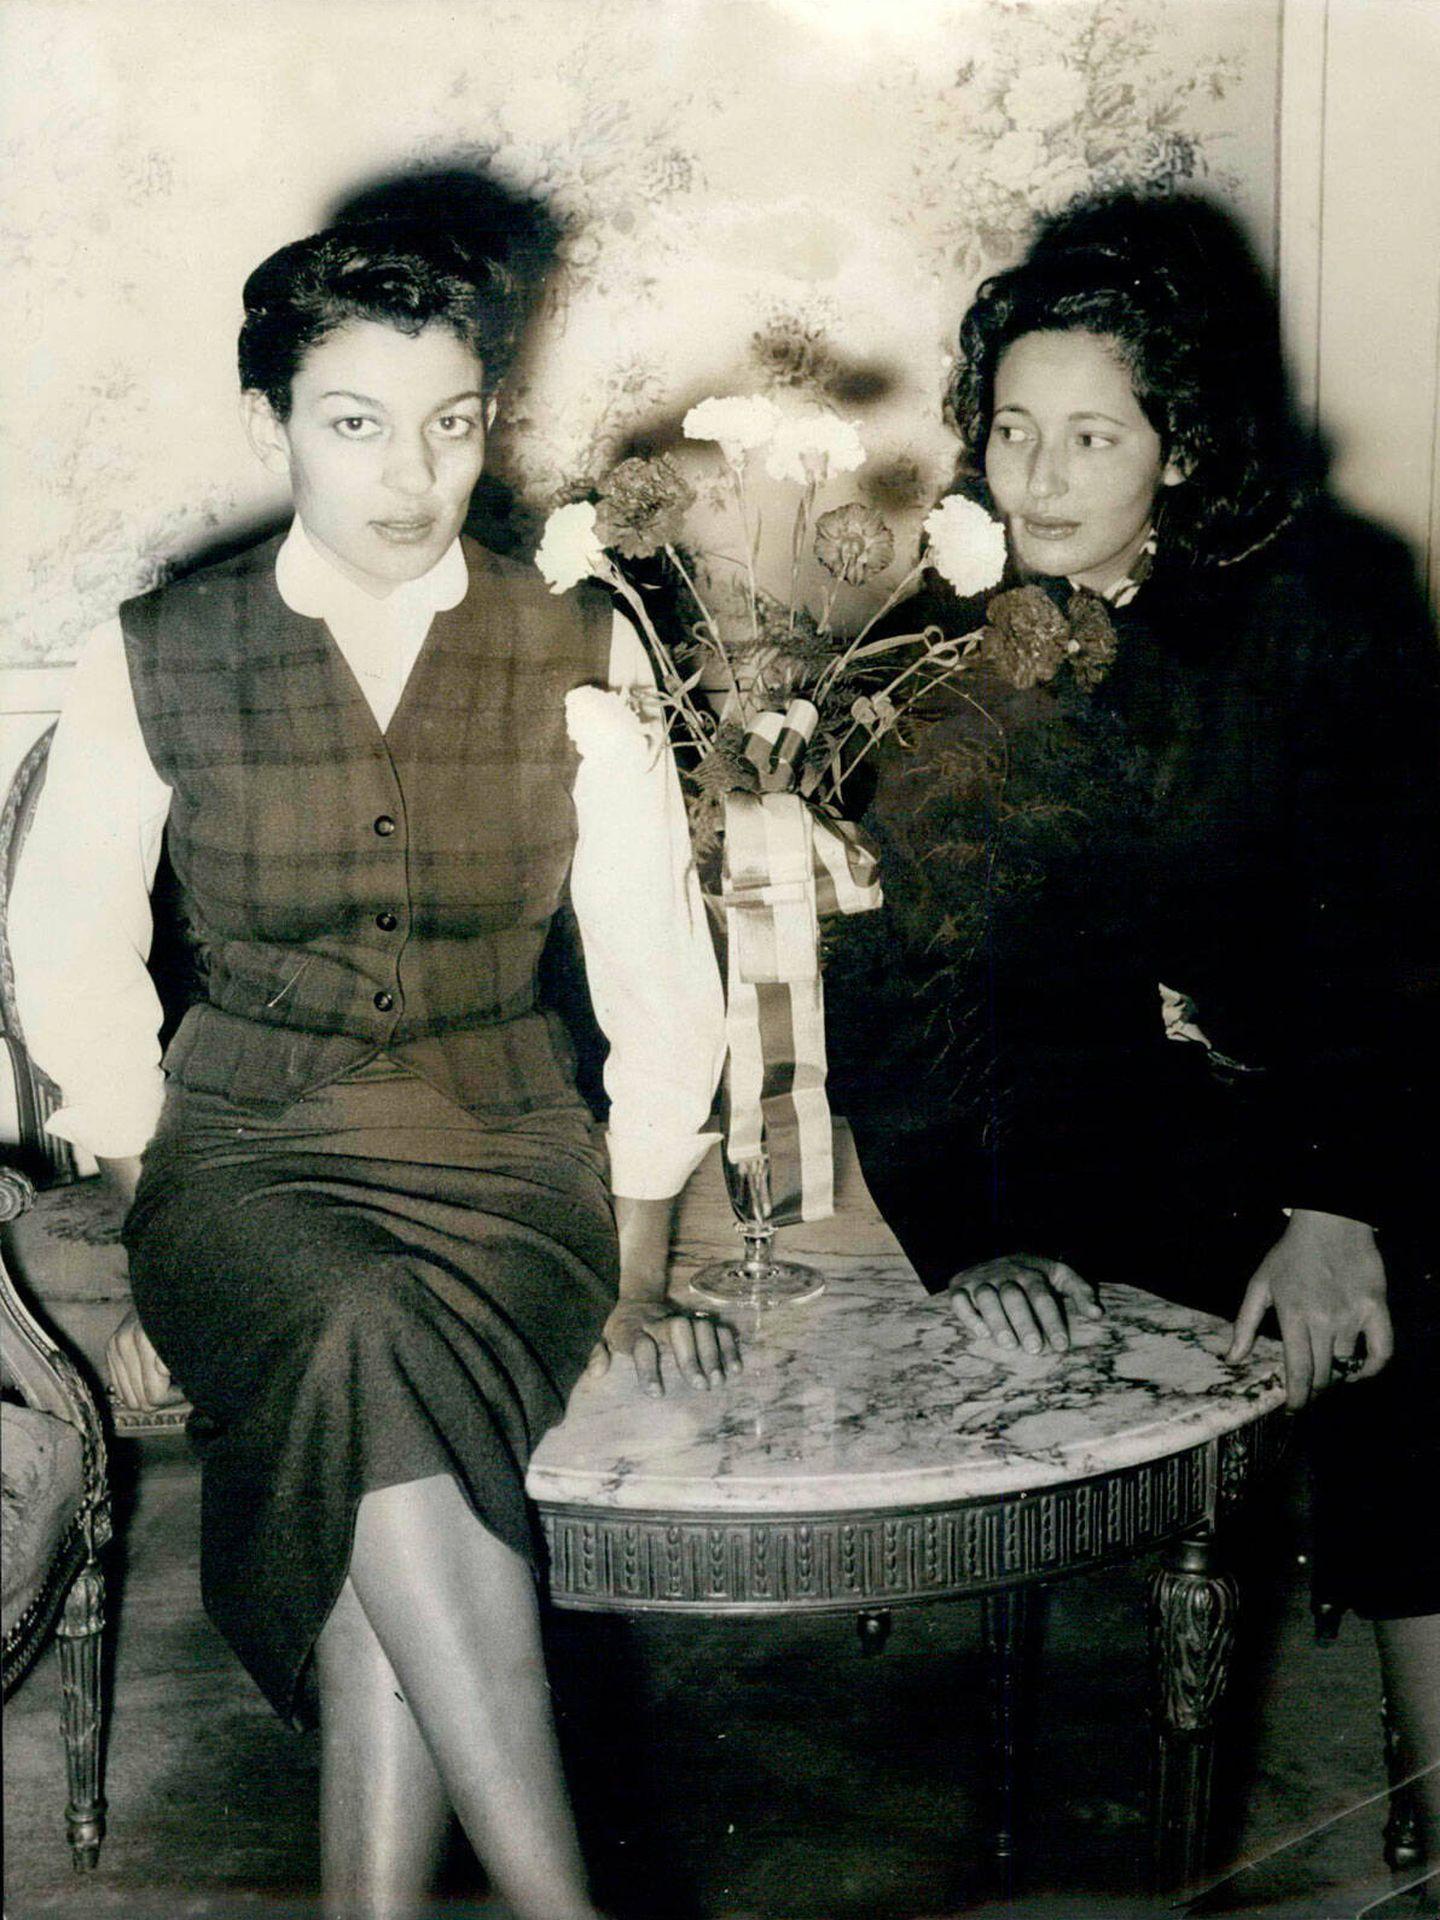 La princesa Lalla Malika, junto a su hermana Lalla Aisha, en 1956. (Alamy)